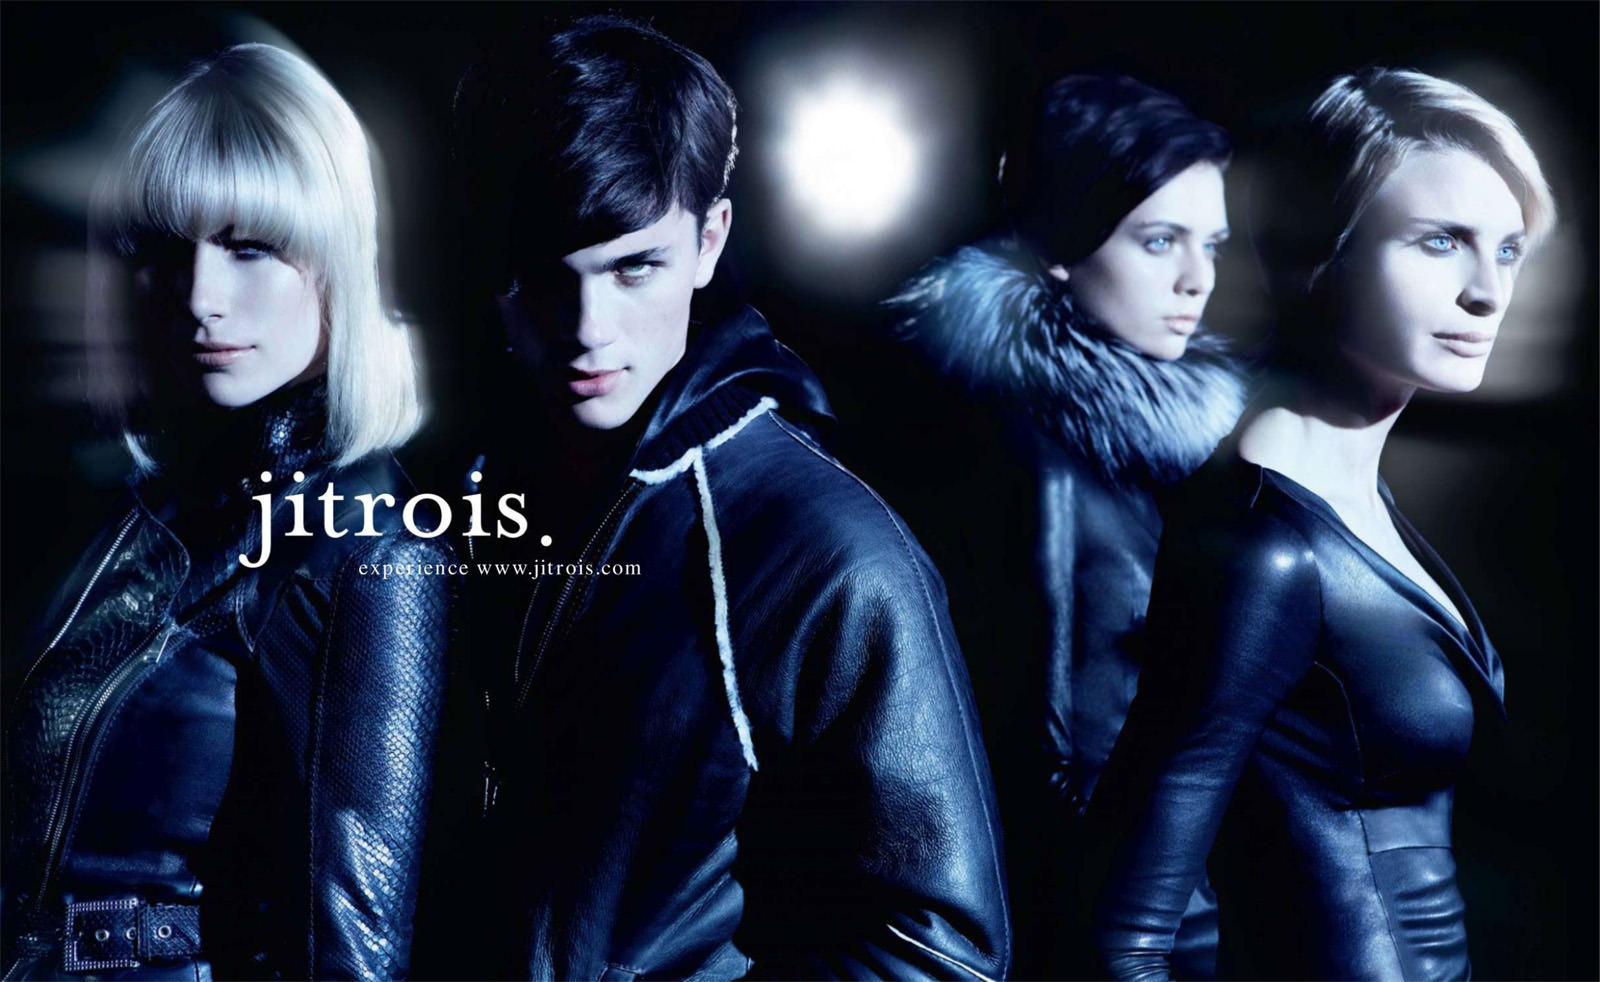 Jitrois Fall Winter 2010 01